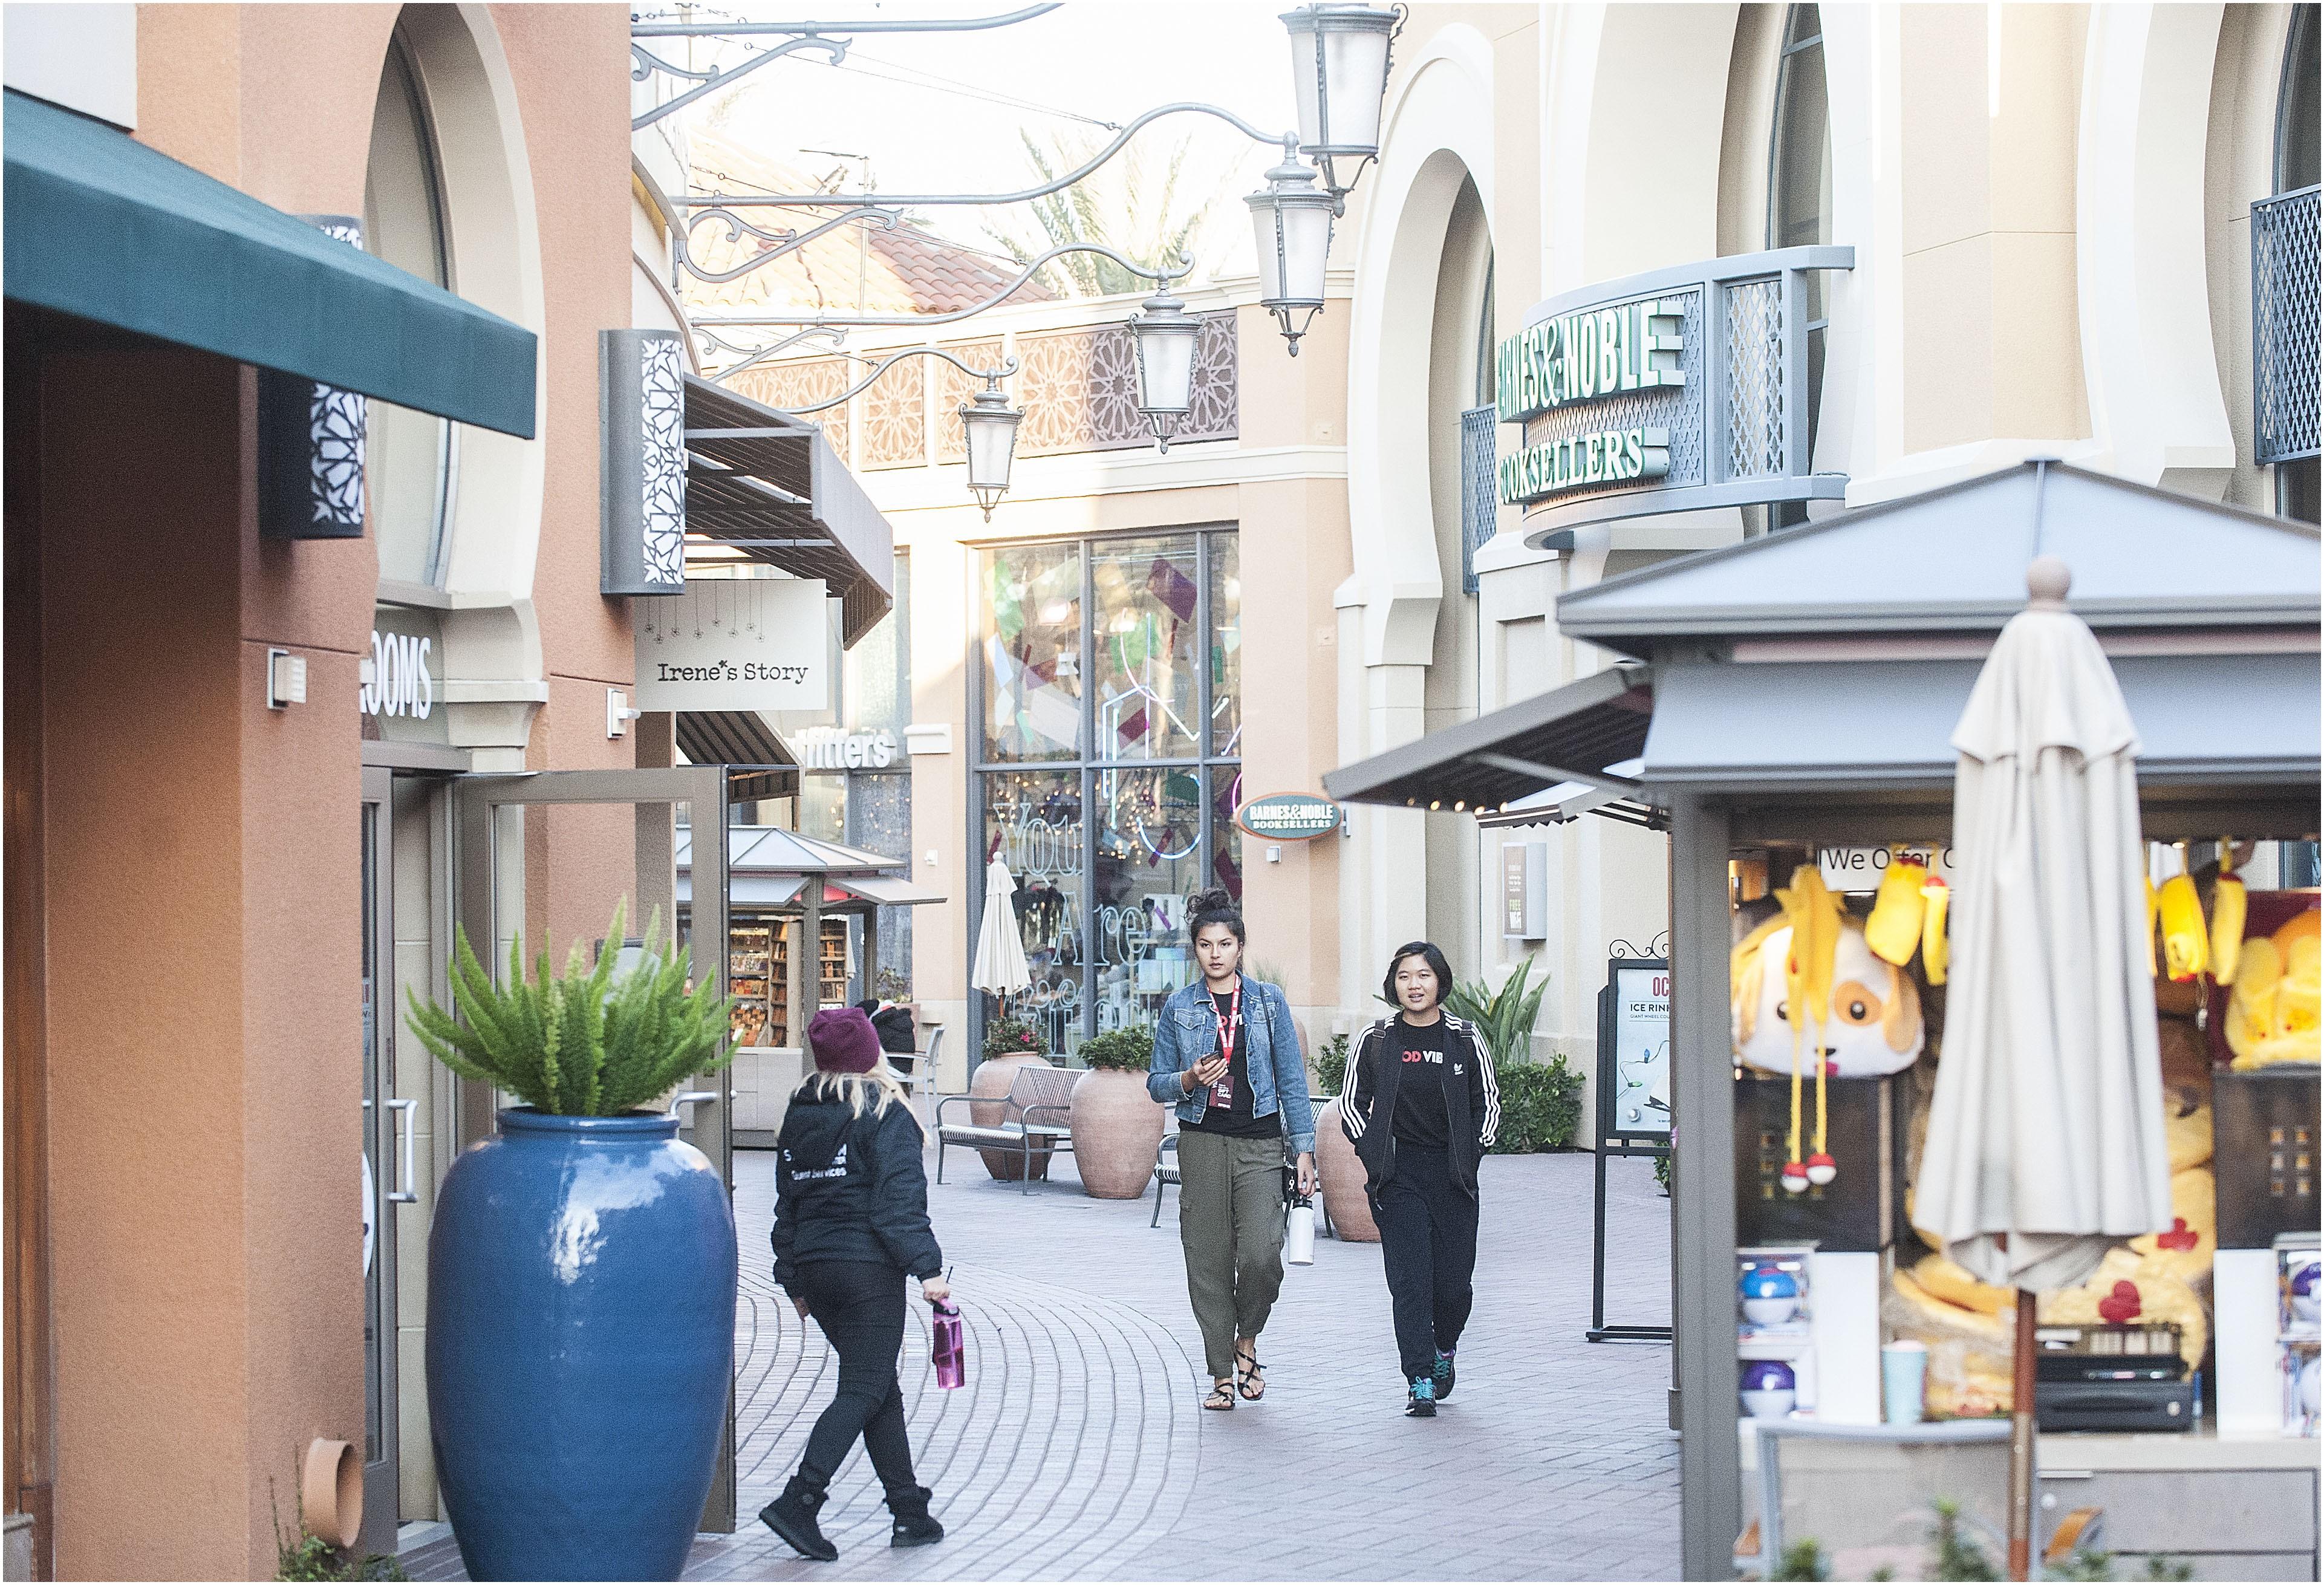 Best Italian Restaurants In Laguna Beach Ca Lovely Best Of orange County 2017 Shopping Dining Destination – orange